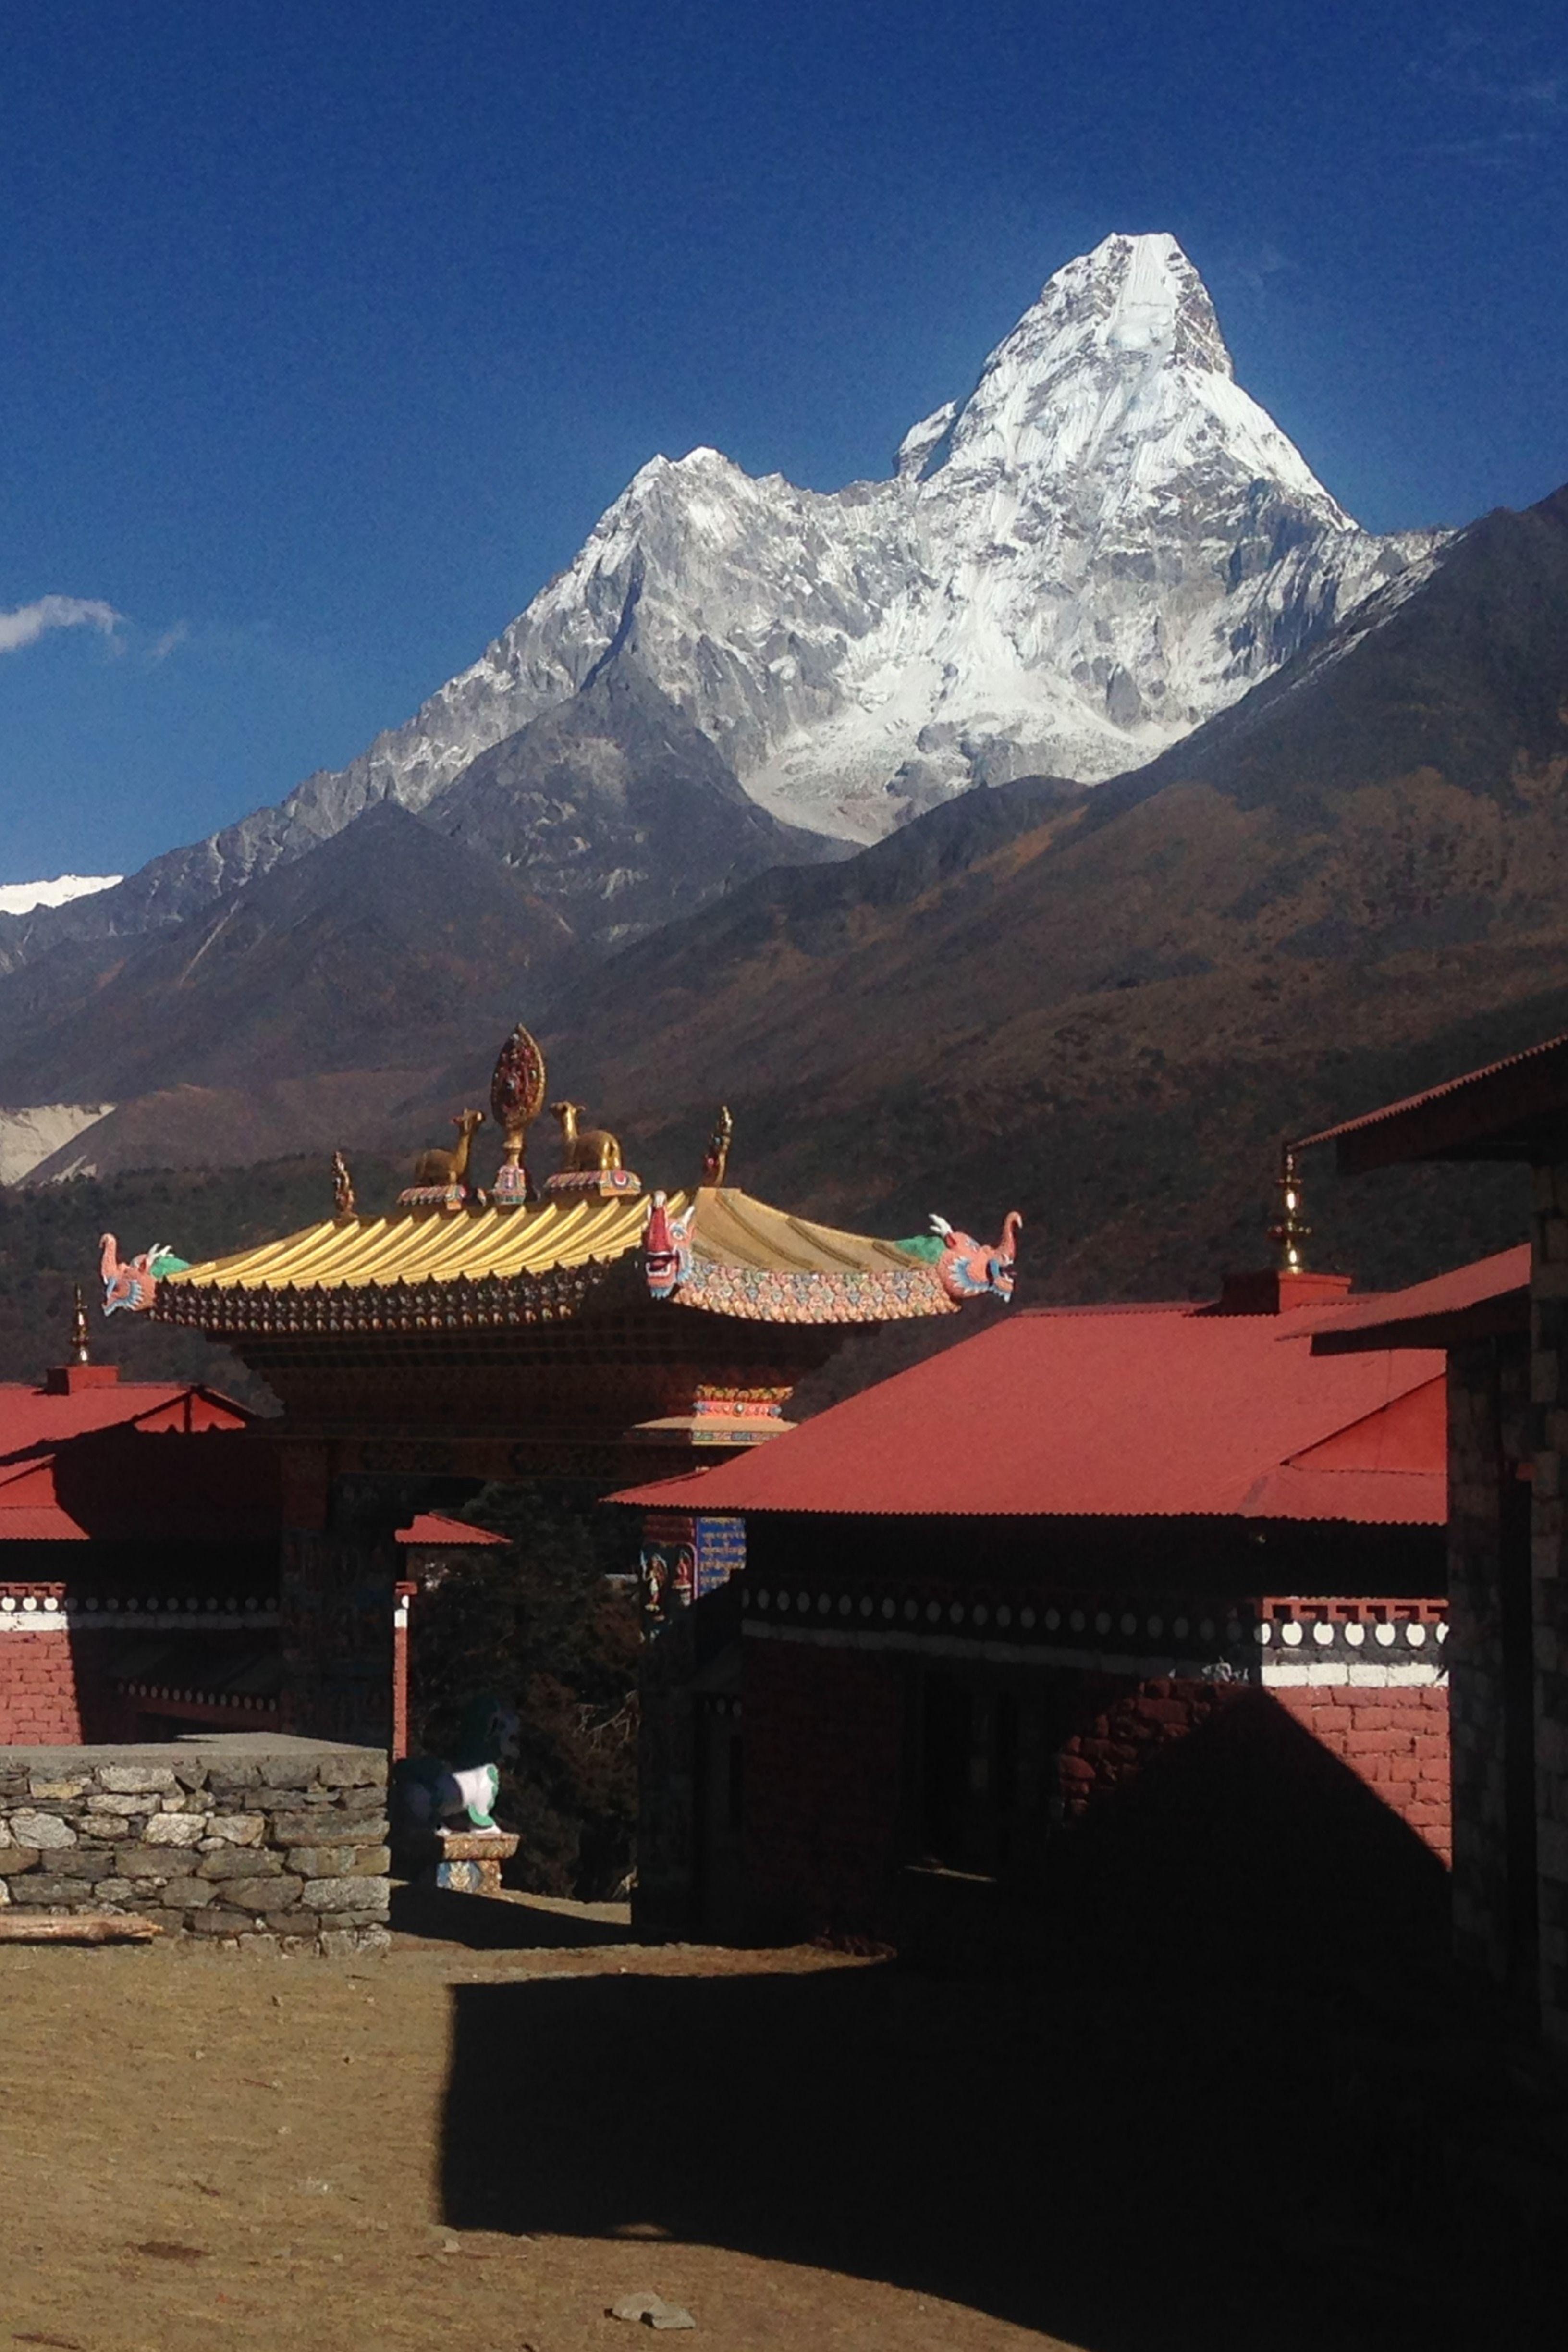 Everest Trekking Is The Most Popular And Best Adventure